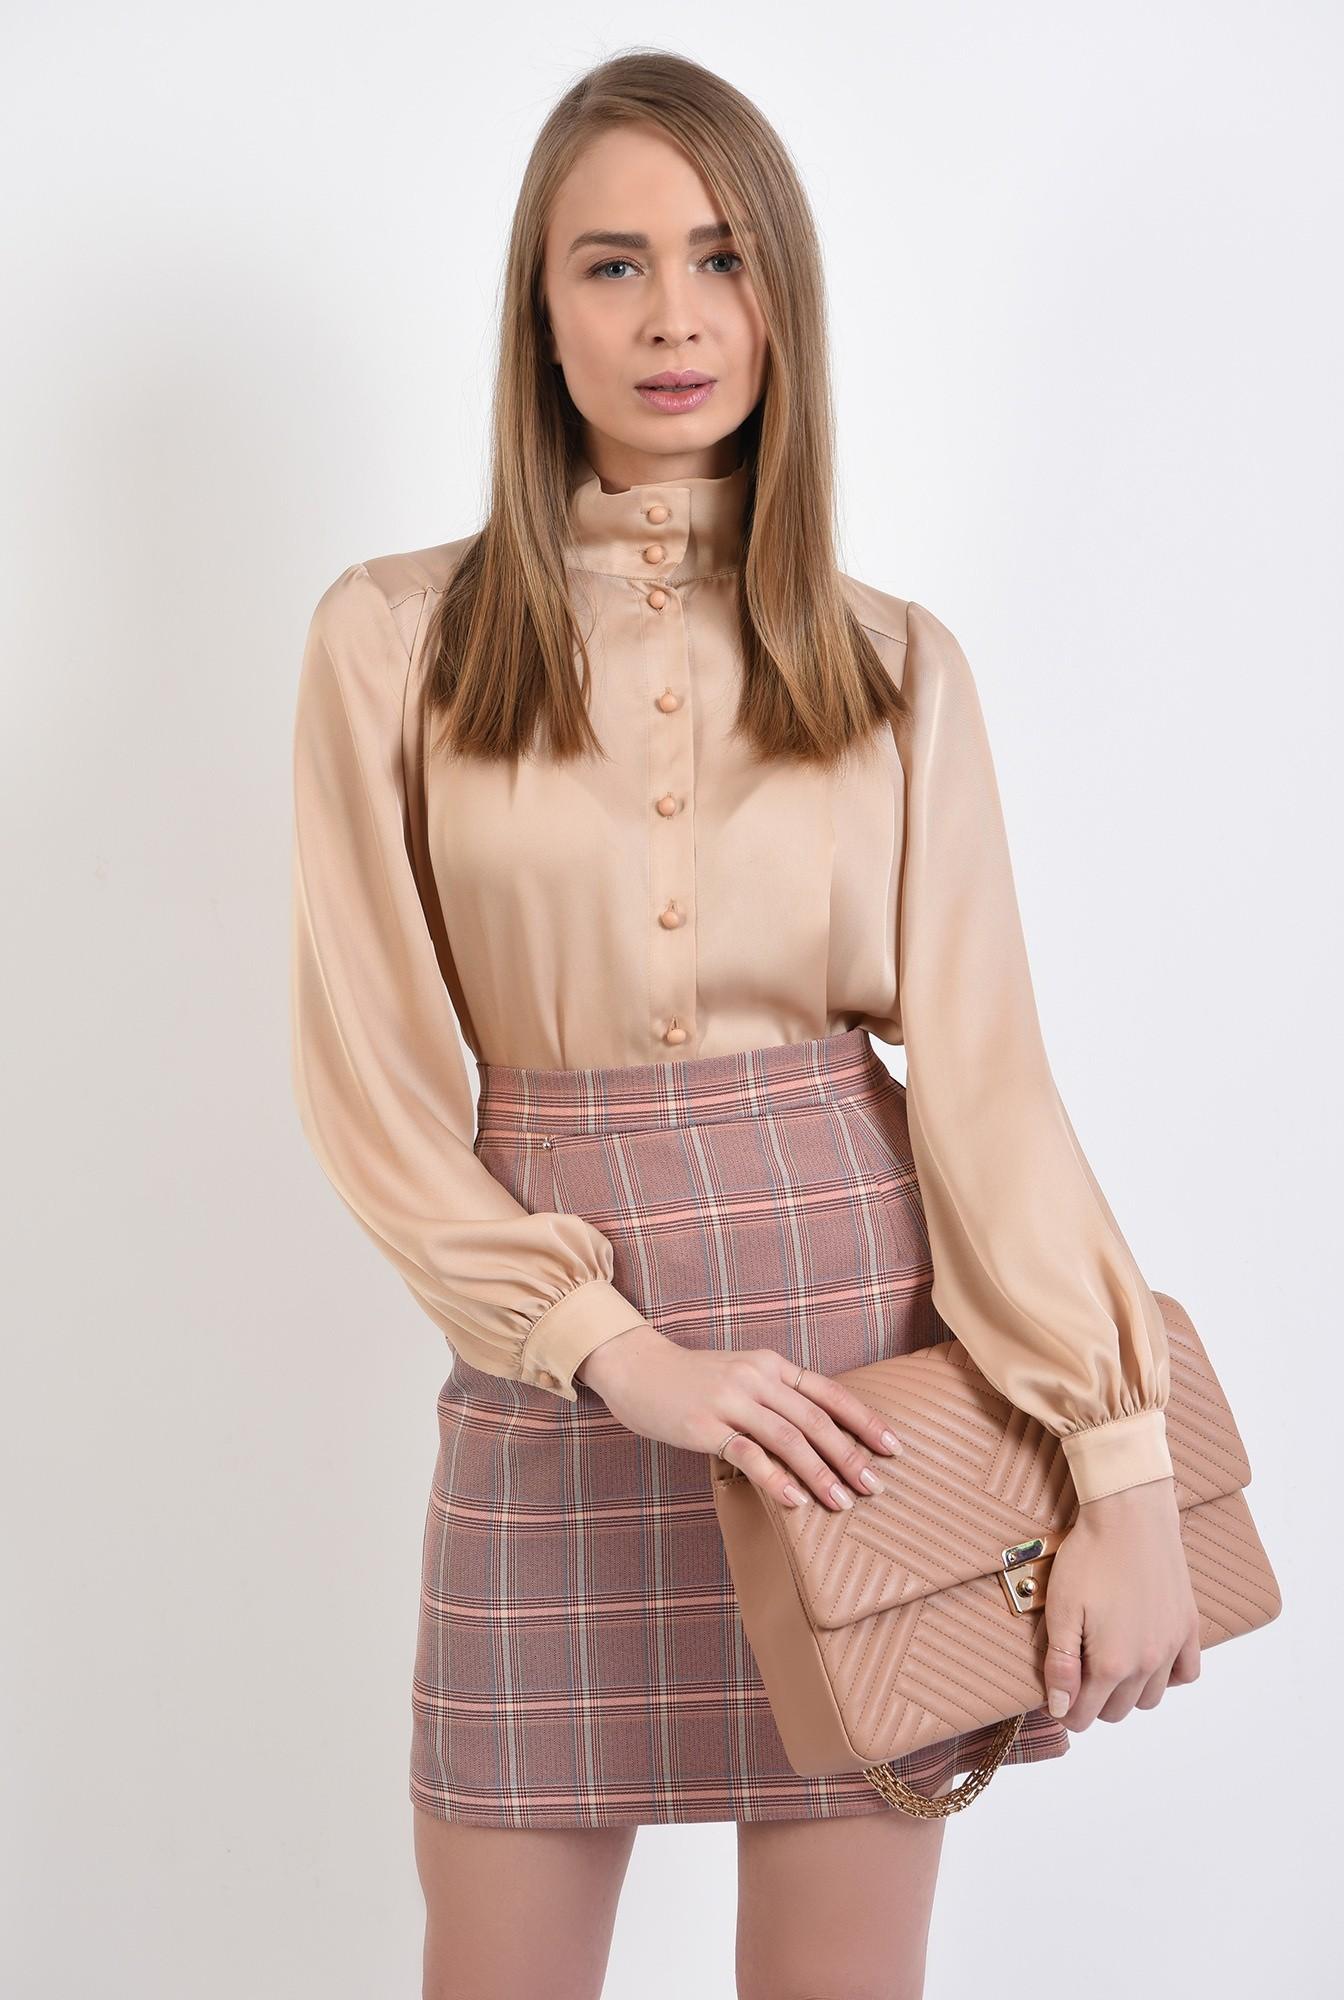 2 -  fusta in carouri, nude, peach, mini, cu talie inalta, fusta office